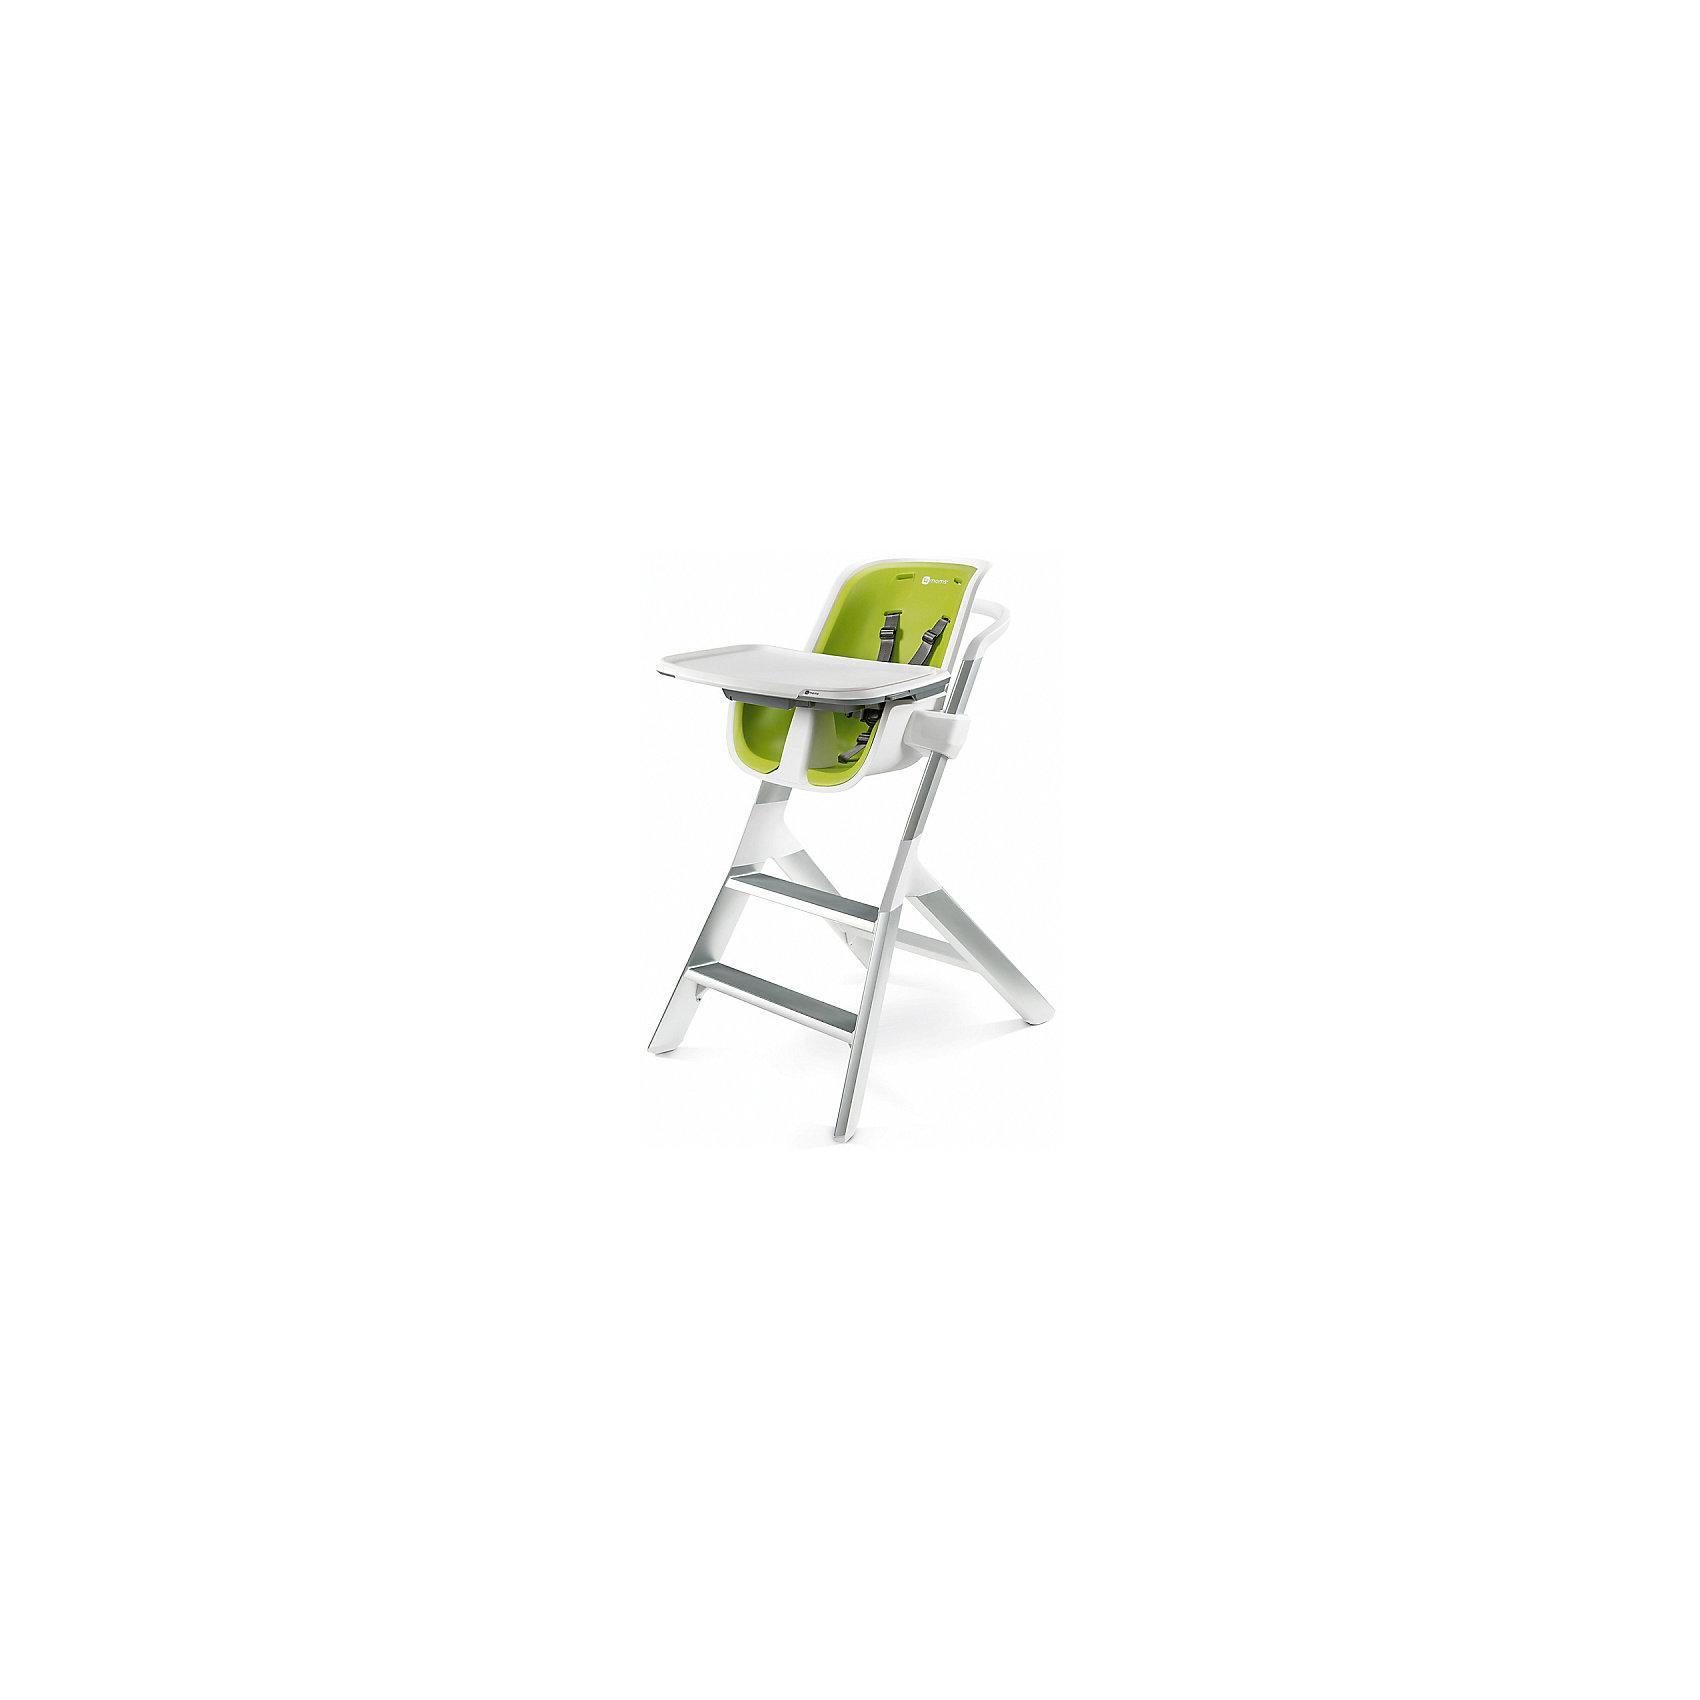 Стульчик для кормления High chair, 4moms, белый/зеленыйот рождения<br>Стульчик для кормления 4 moms High chair белый/зеленый<br><br>Ширина мм: 960<br>Глубина мм: 560<br>Высота мм: 710<br>Вес г: 7400<br>Возраст от месяцев: 0<br>Возраст до месяцев: 36<br>Пол: Унисекс<br>Возраст: Детский<br>SKU: 5572093